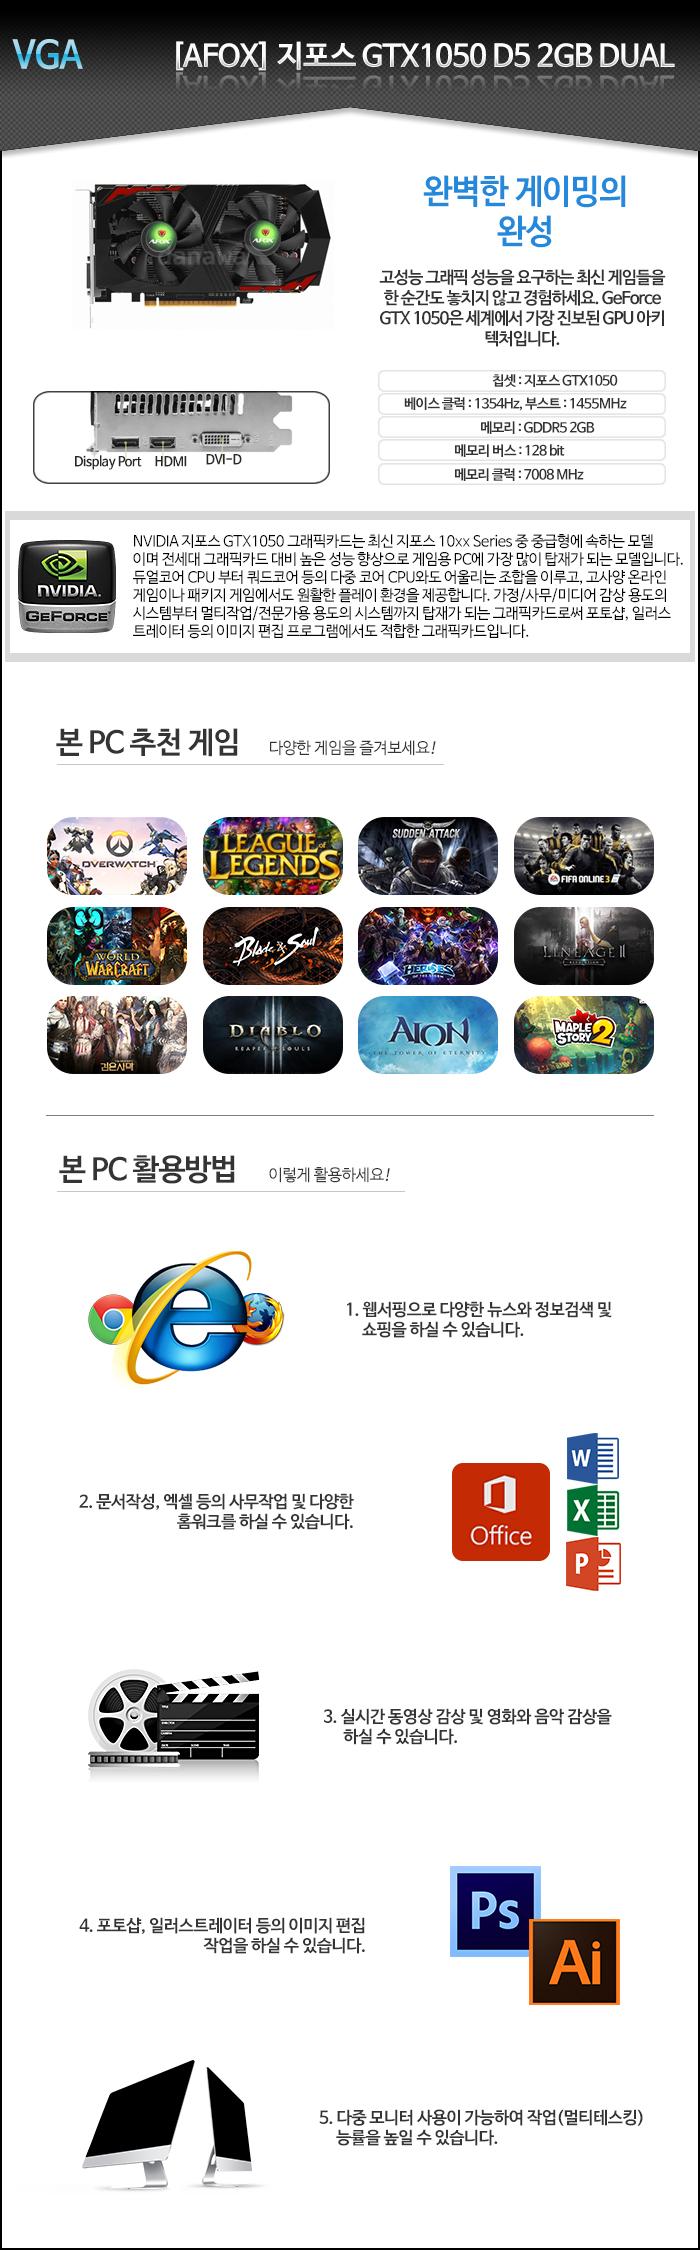 [AFOX] 지포스 GTX1050 D5 2GB DUAL